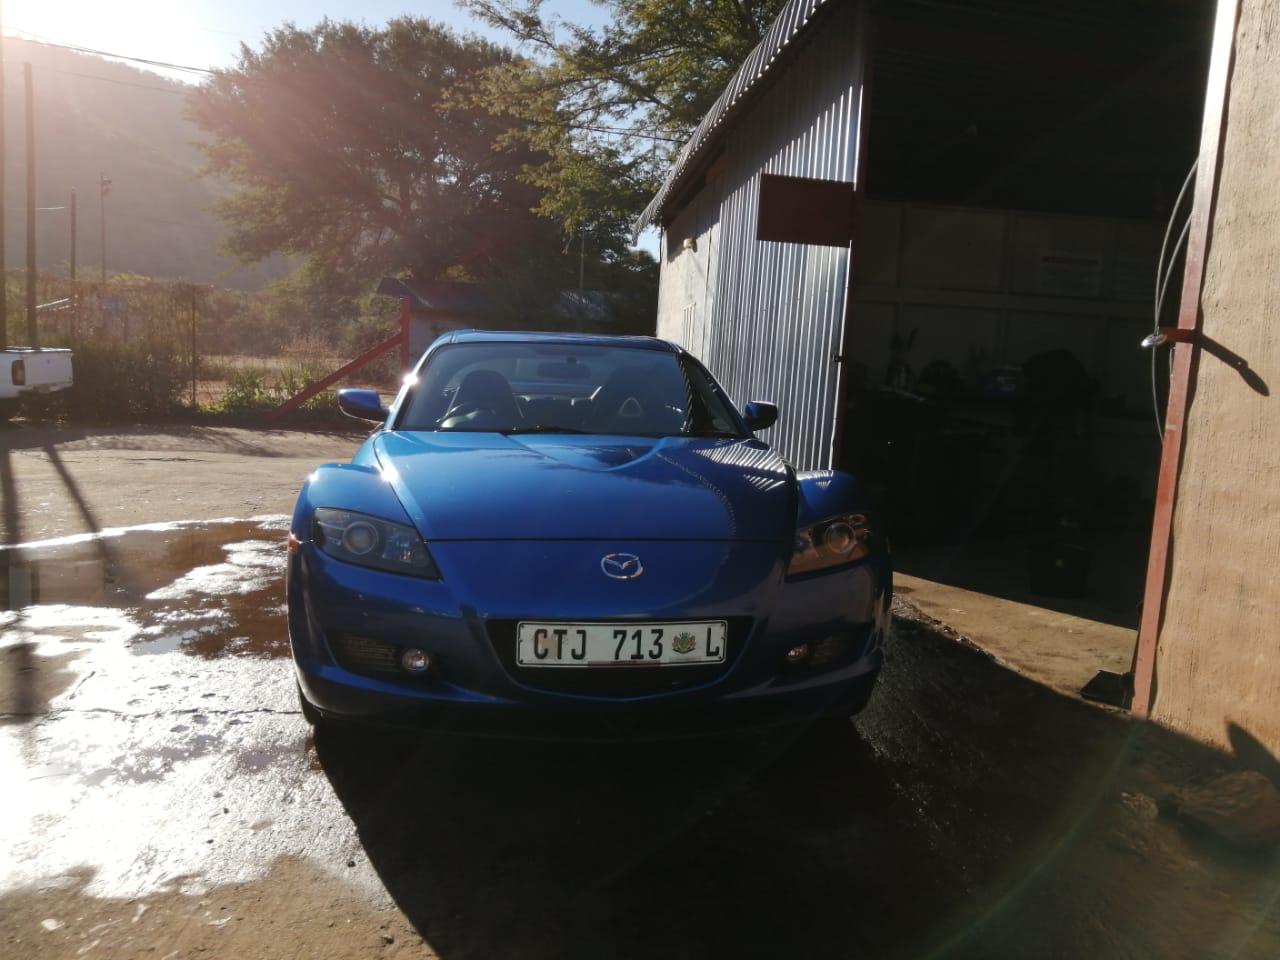 2004 Mazda RX-8 6 speed